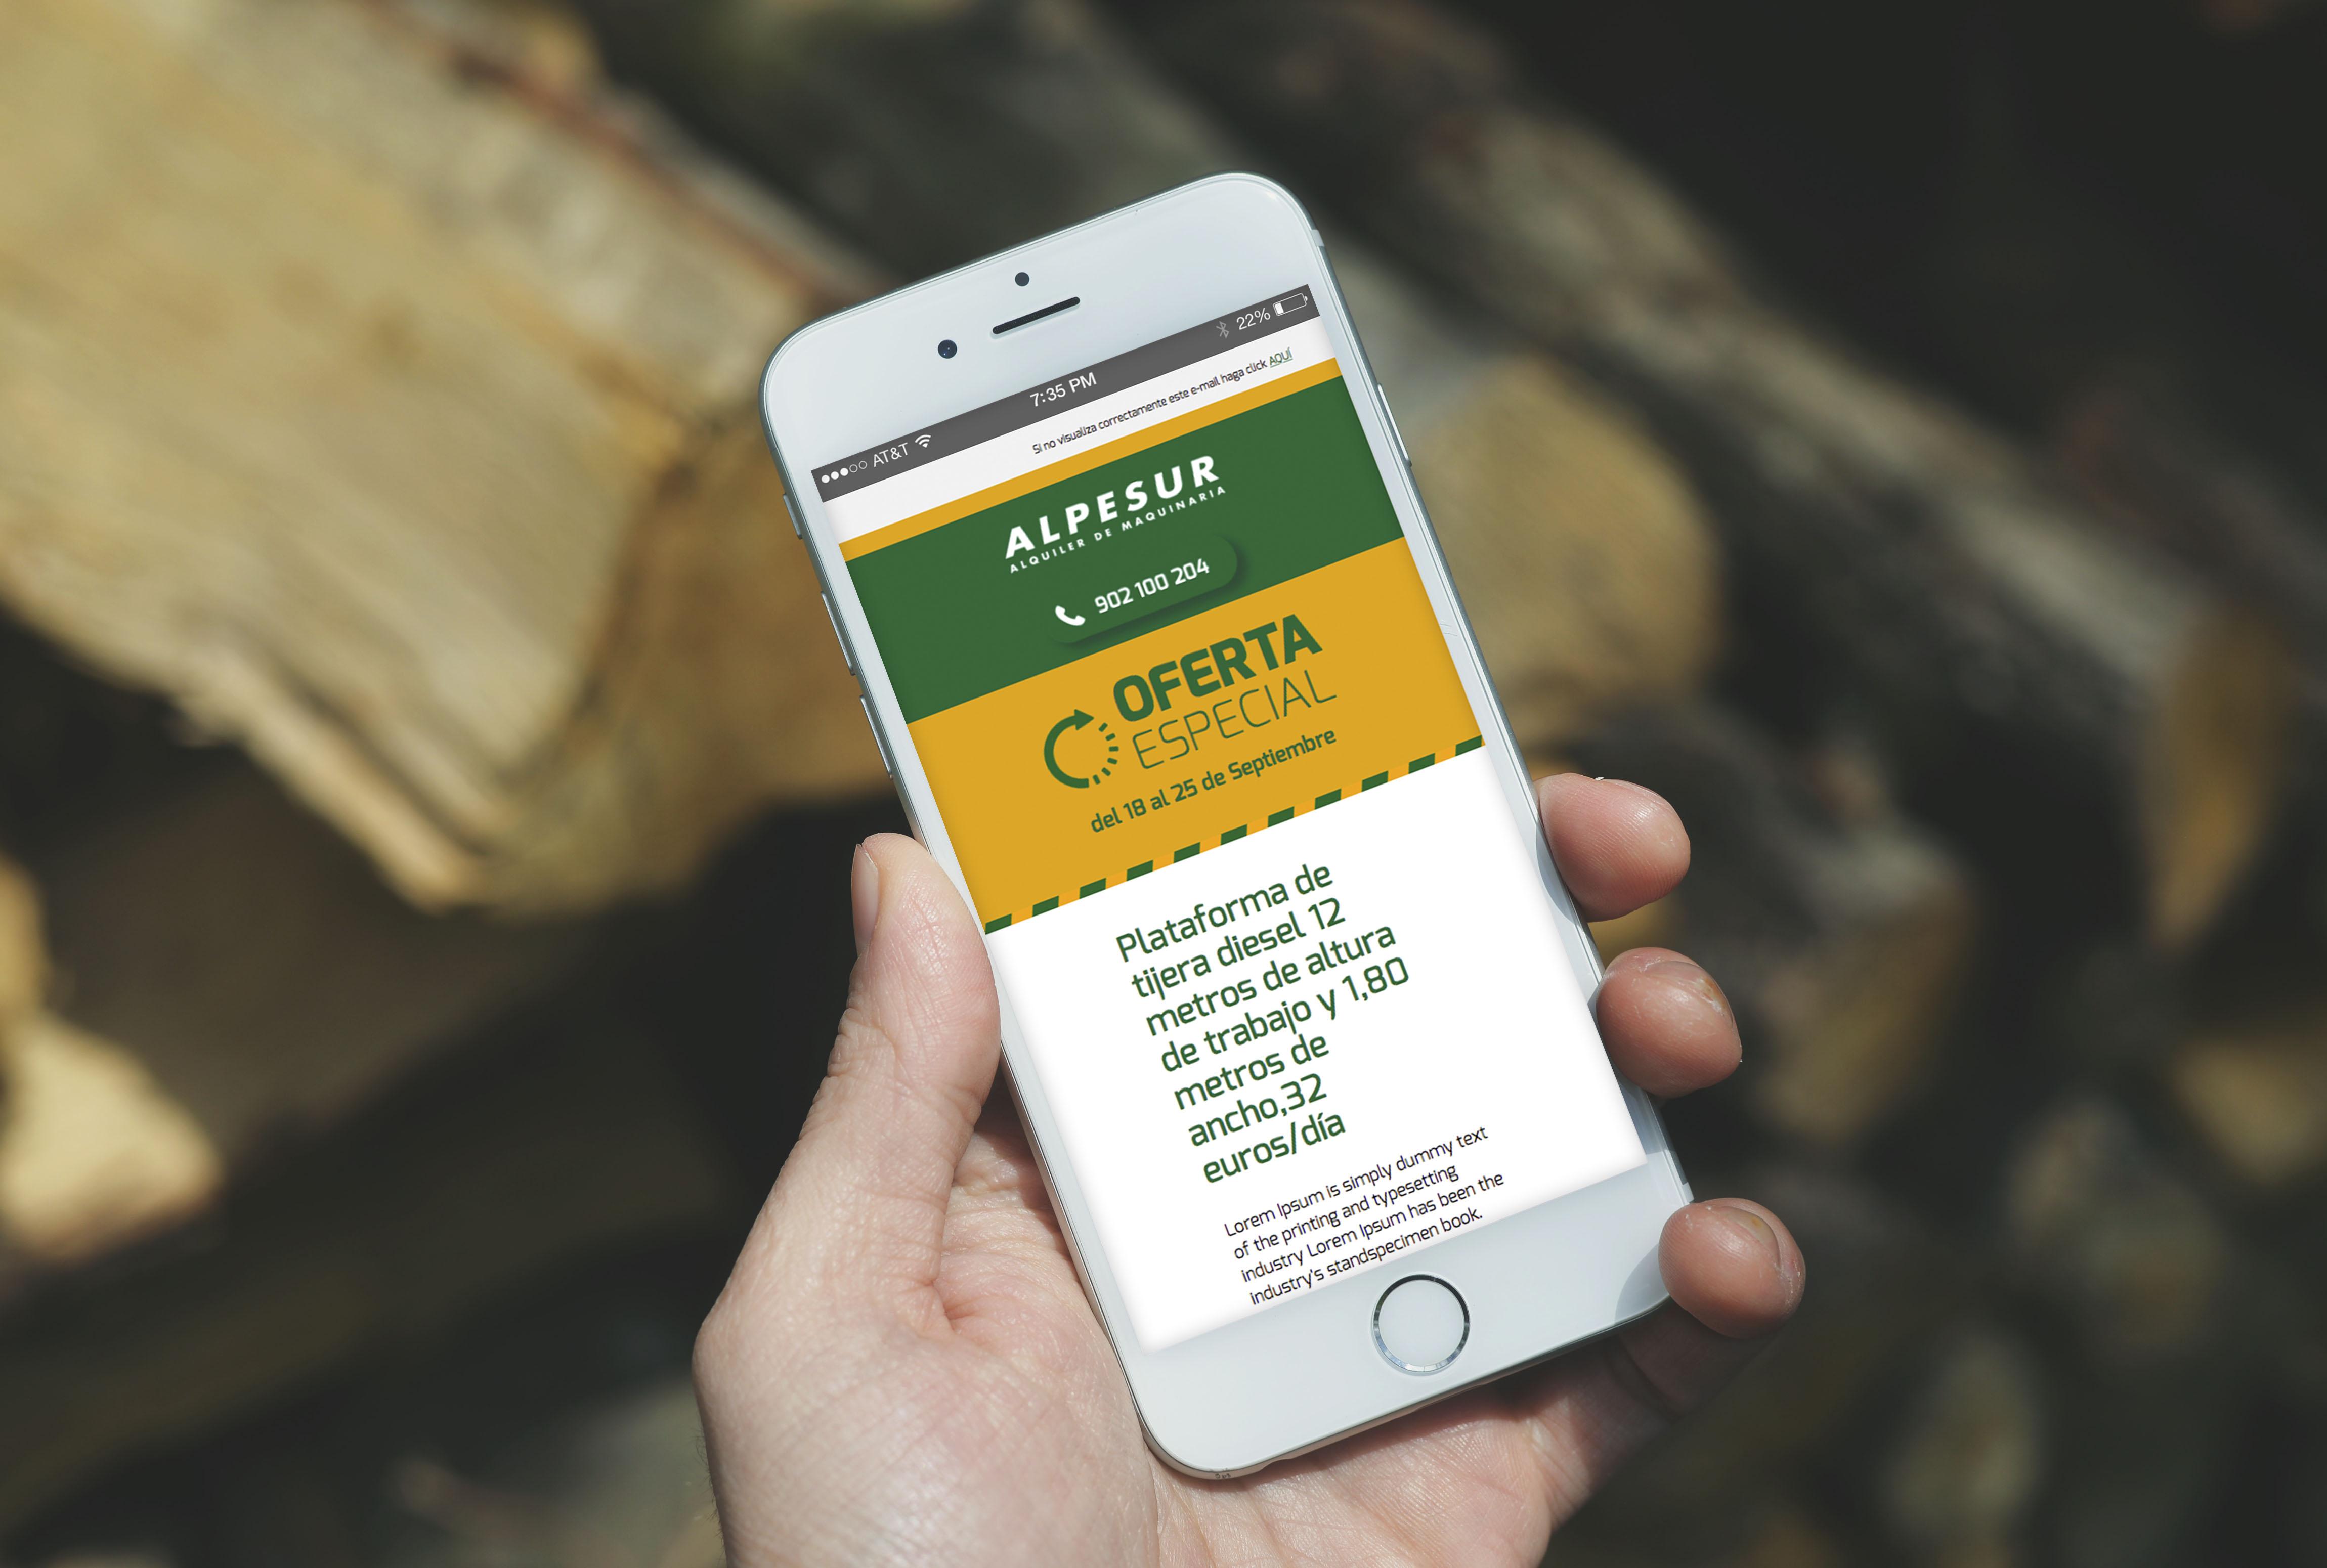 Diseño de email Alpesur